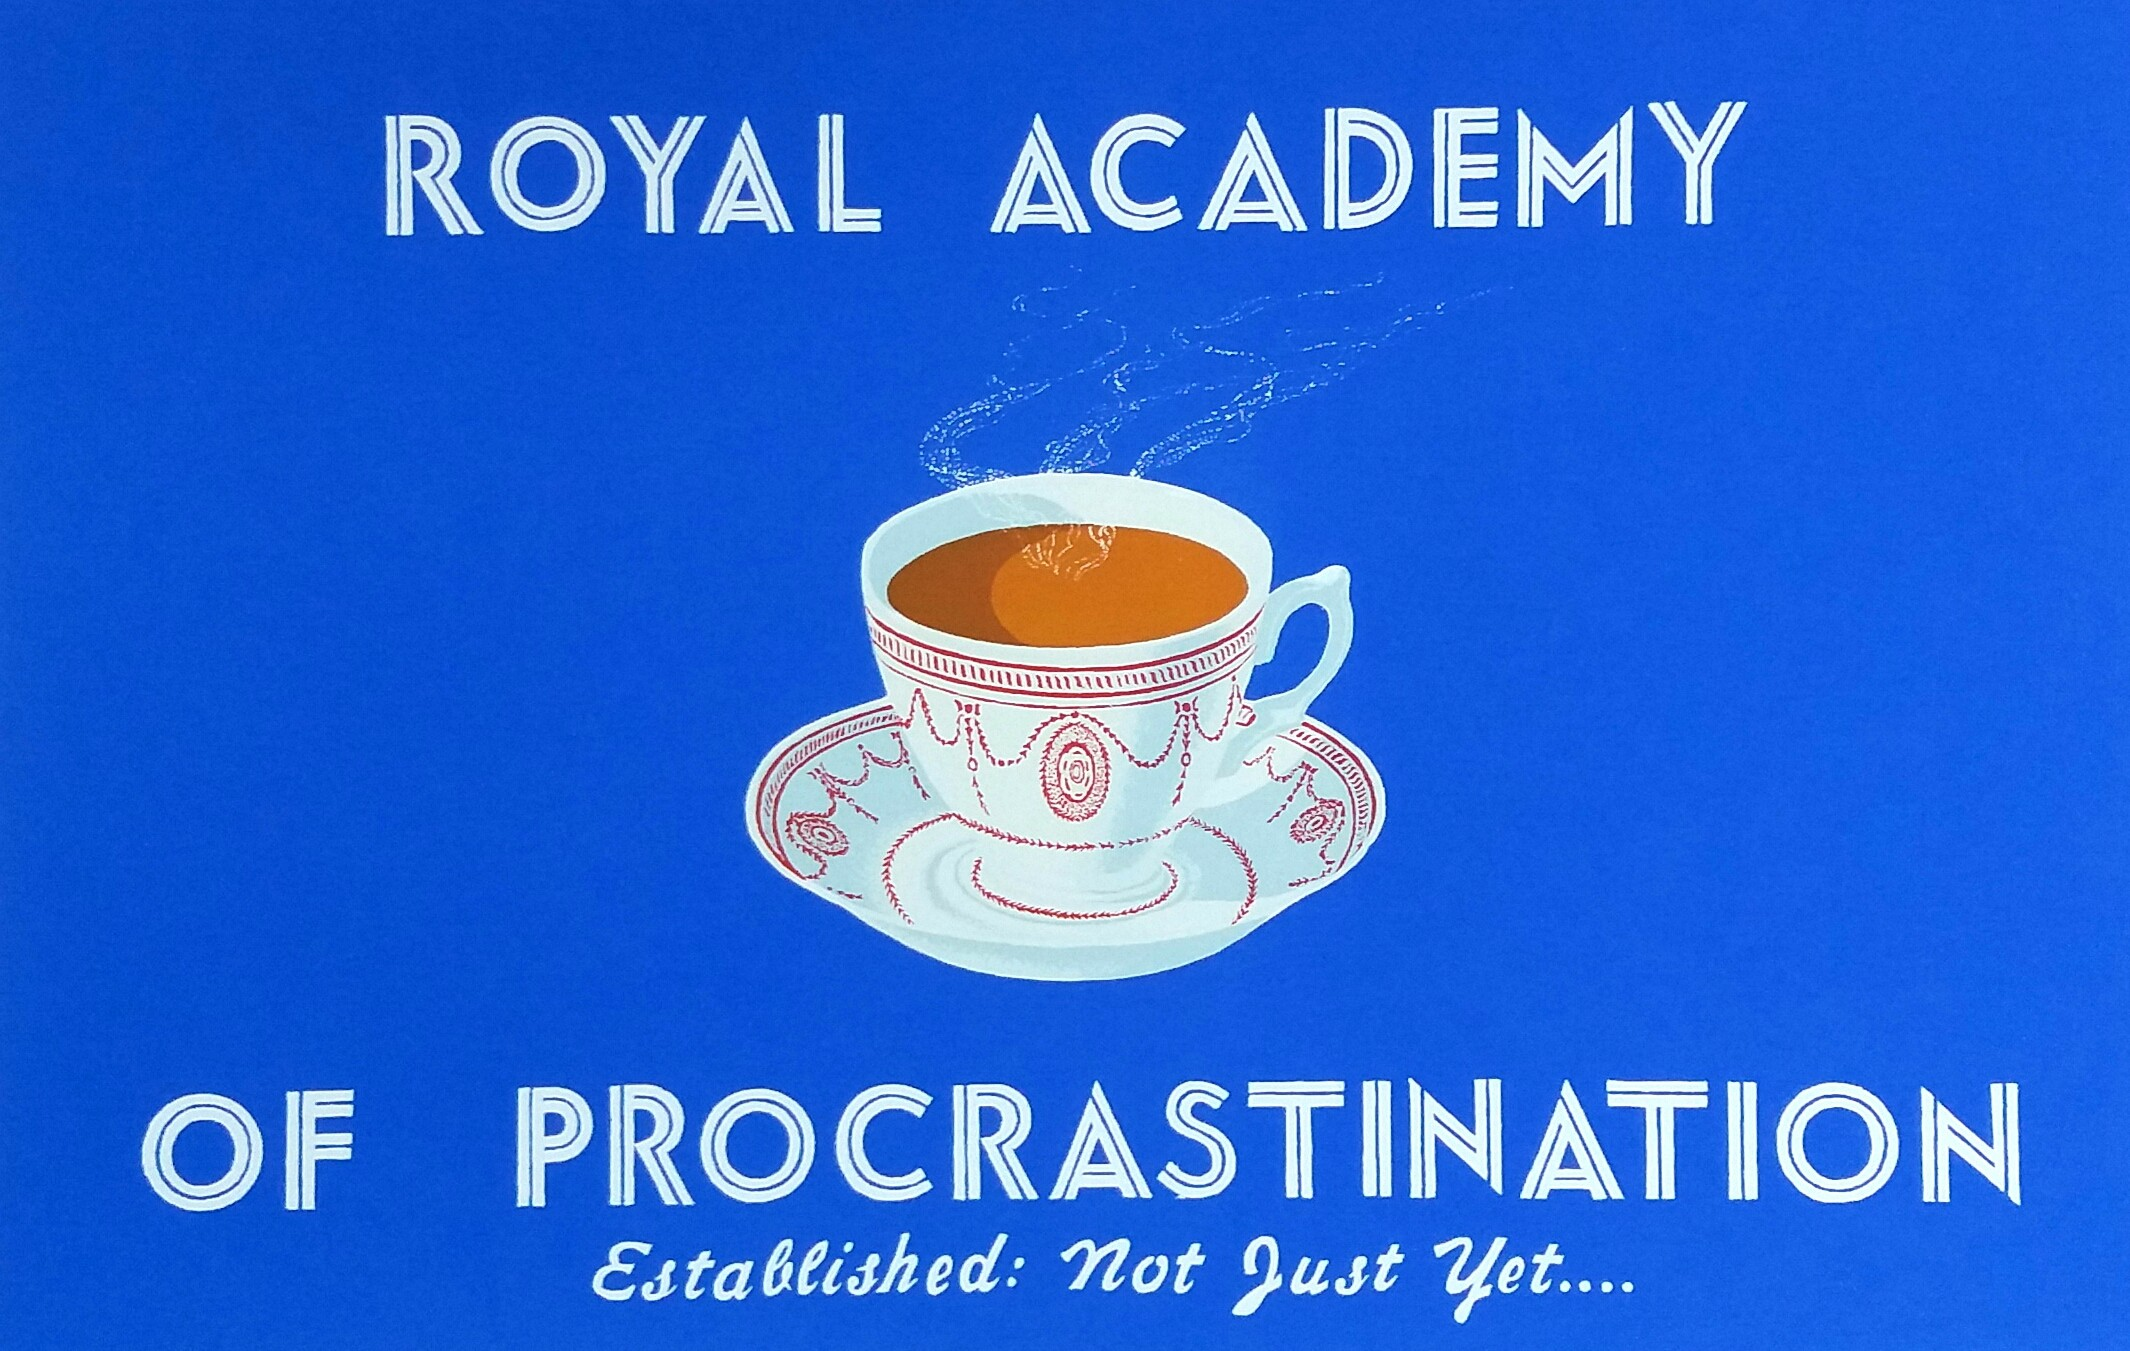 Martin Grover, Royal Academy of Procrastination, 2019, £200, silkscreen print, limited edition of 25, Wills Art Warehouse